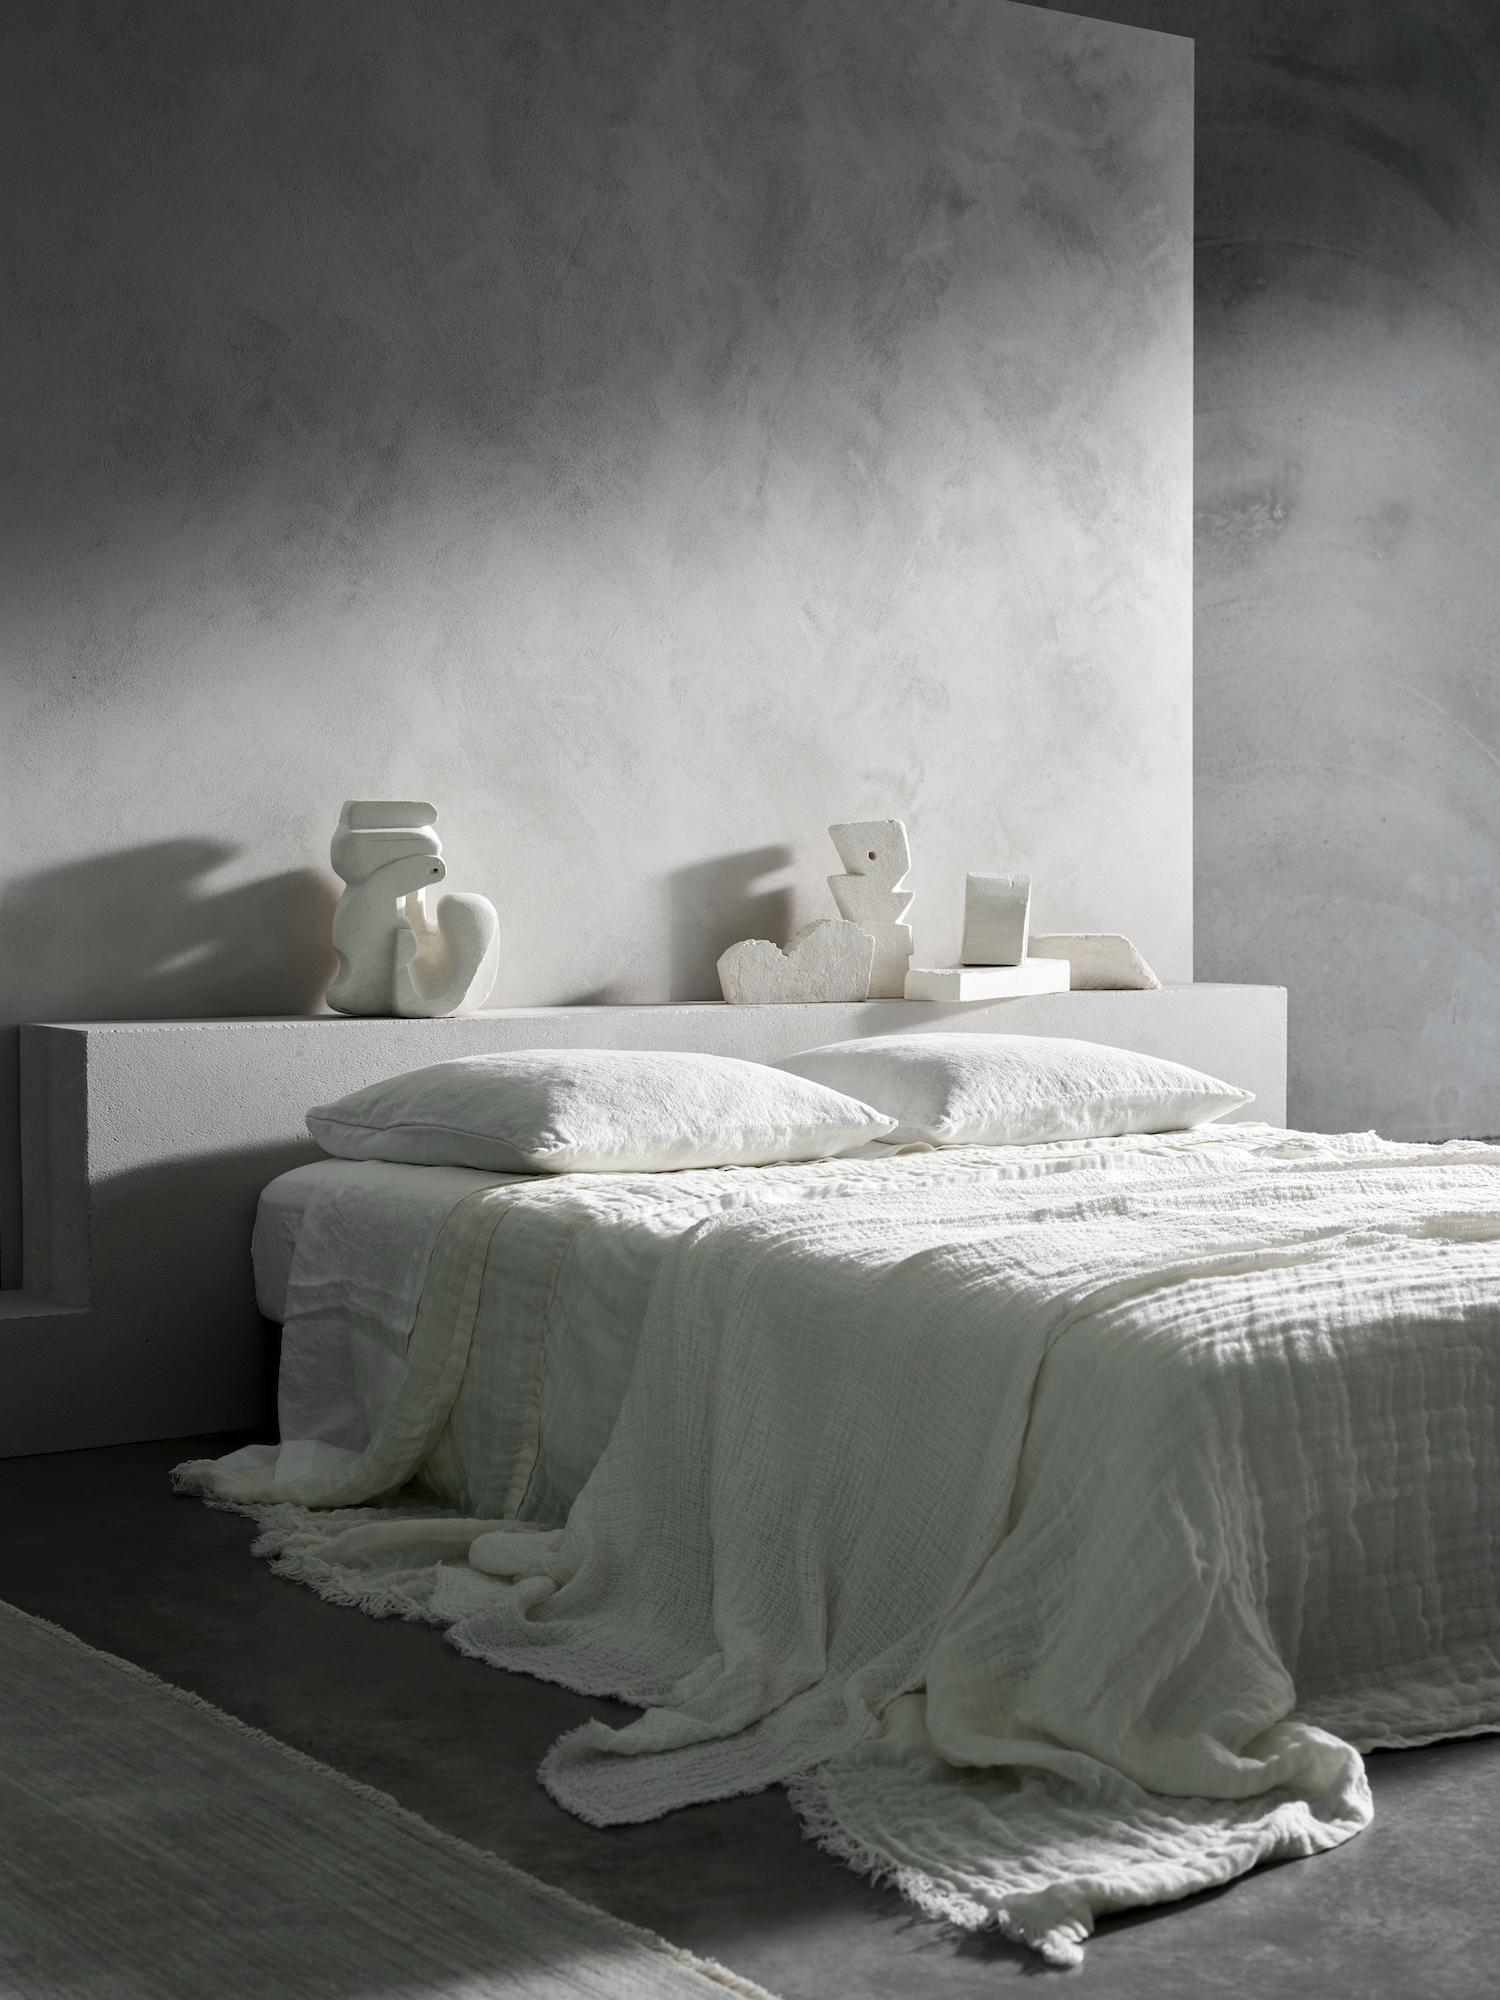 est living bedouin societe blankets throws 2